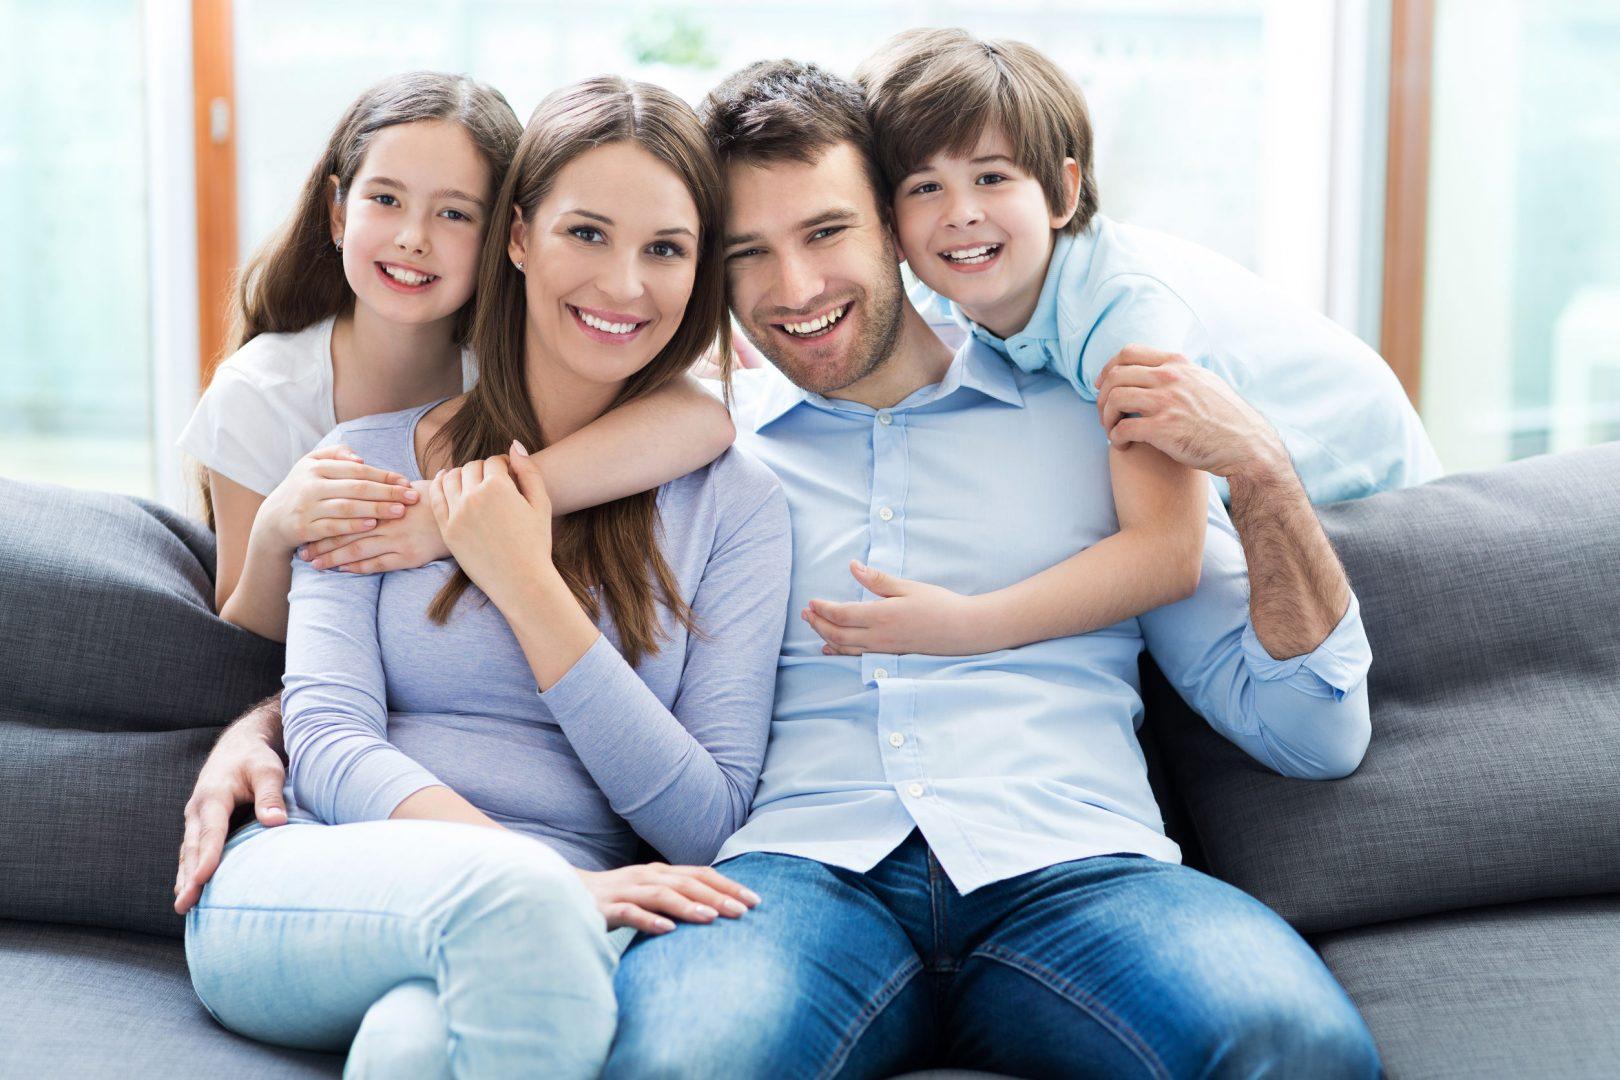 webooking happy family